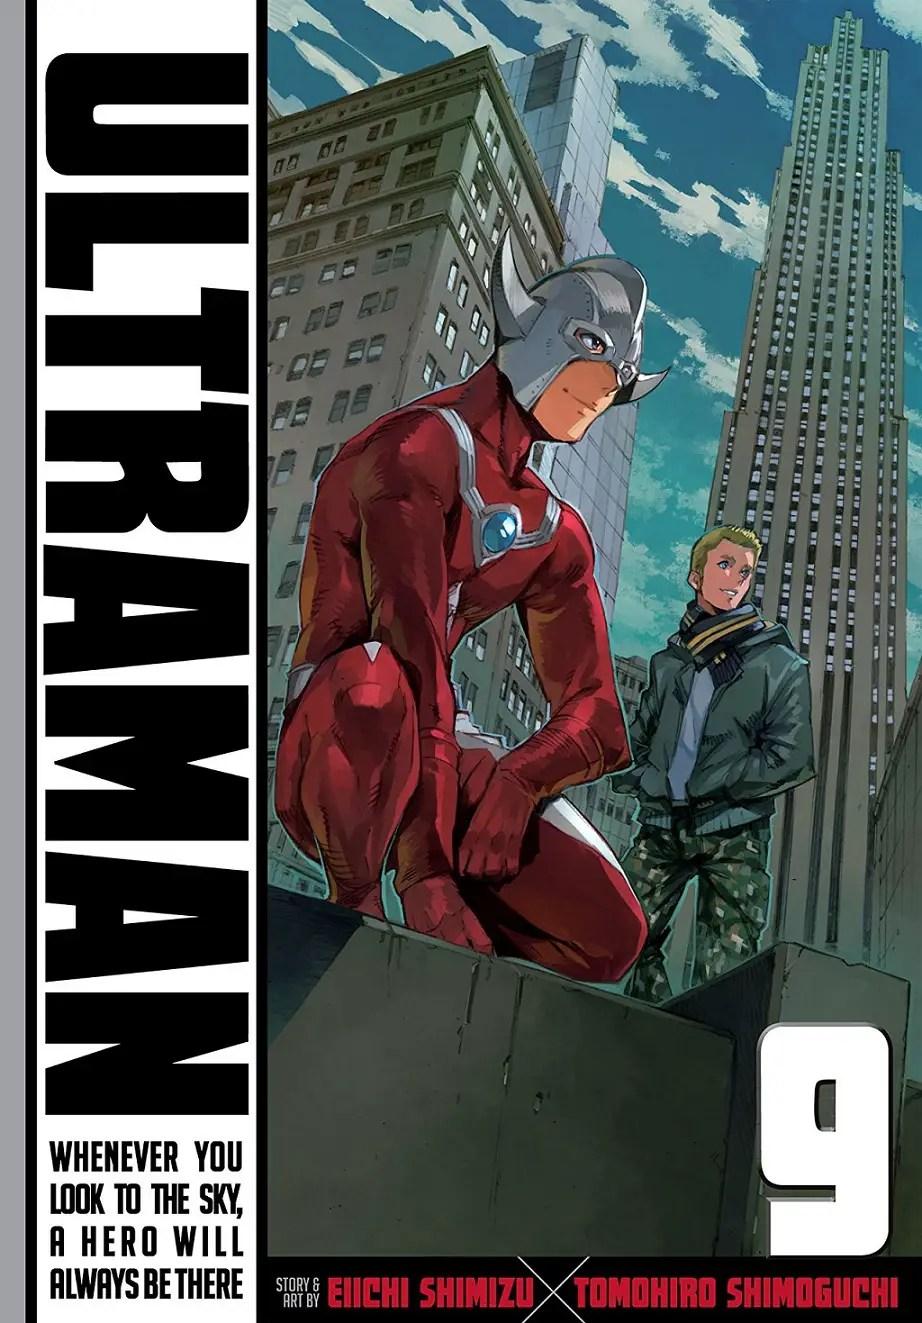 Ultraman Vol. 9 Review